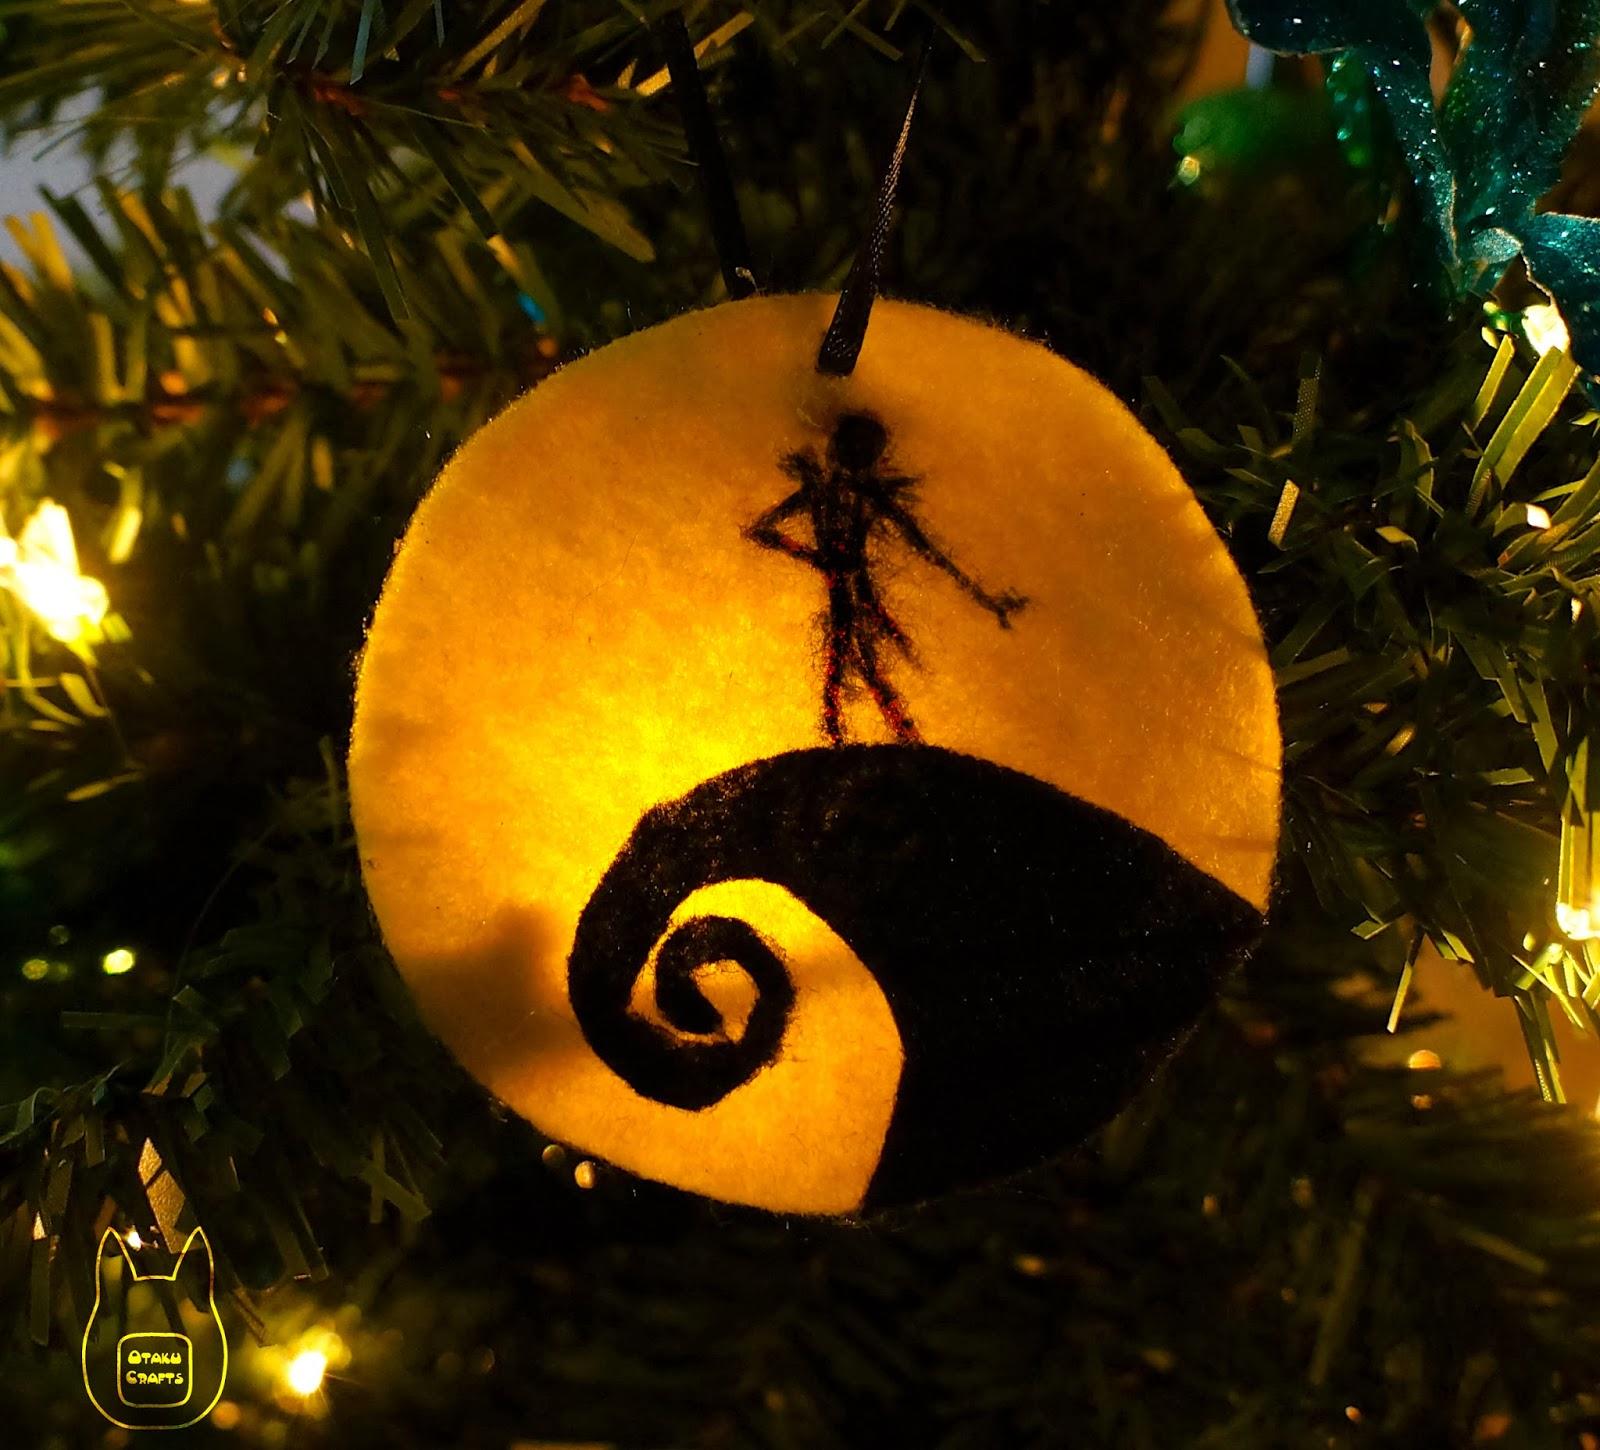 Otaku Crafts: Nightmare Before Christmas Ornament